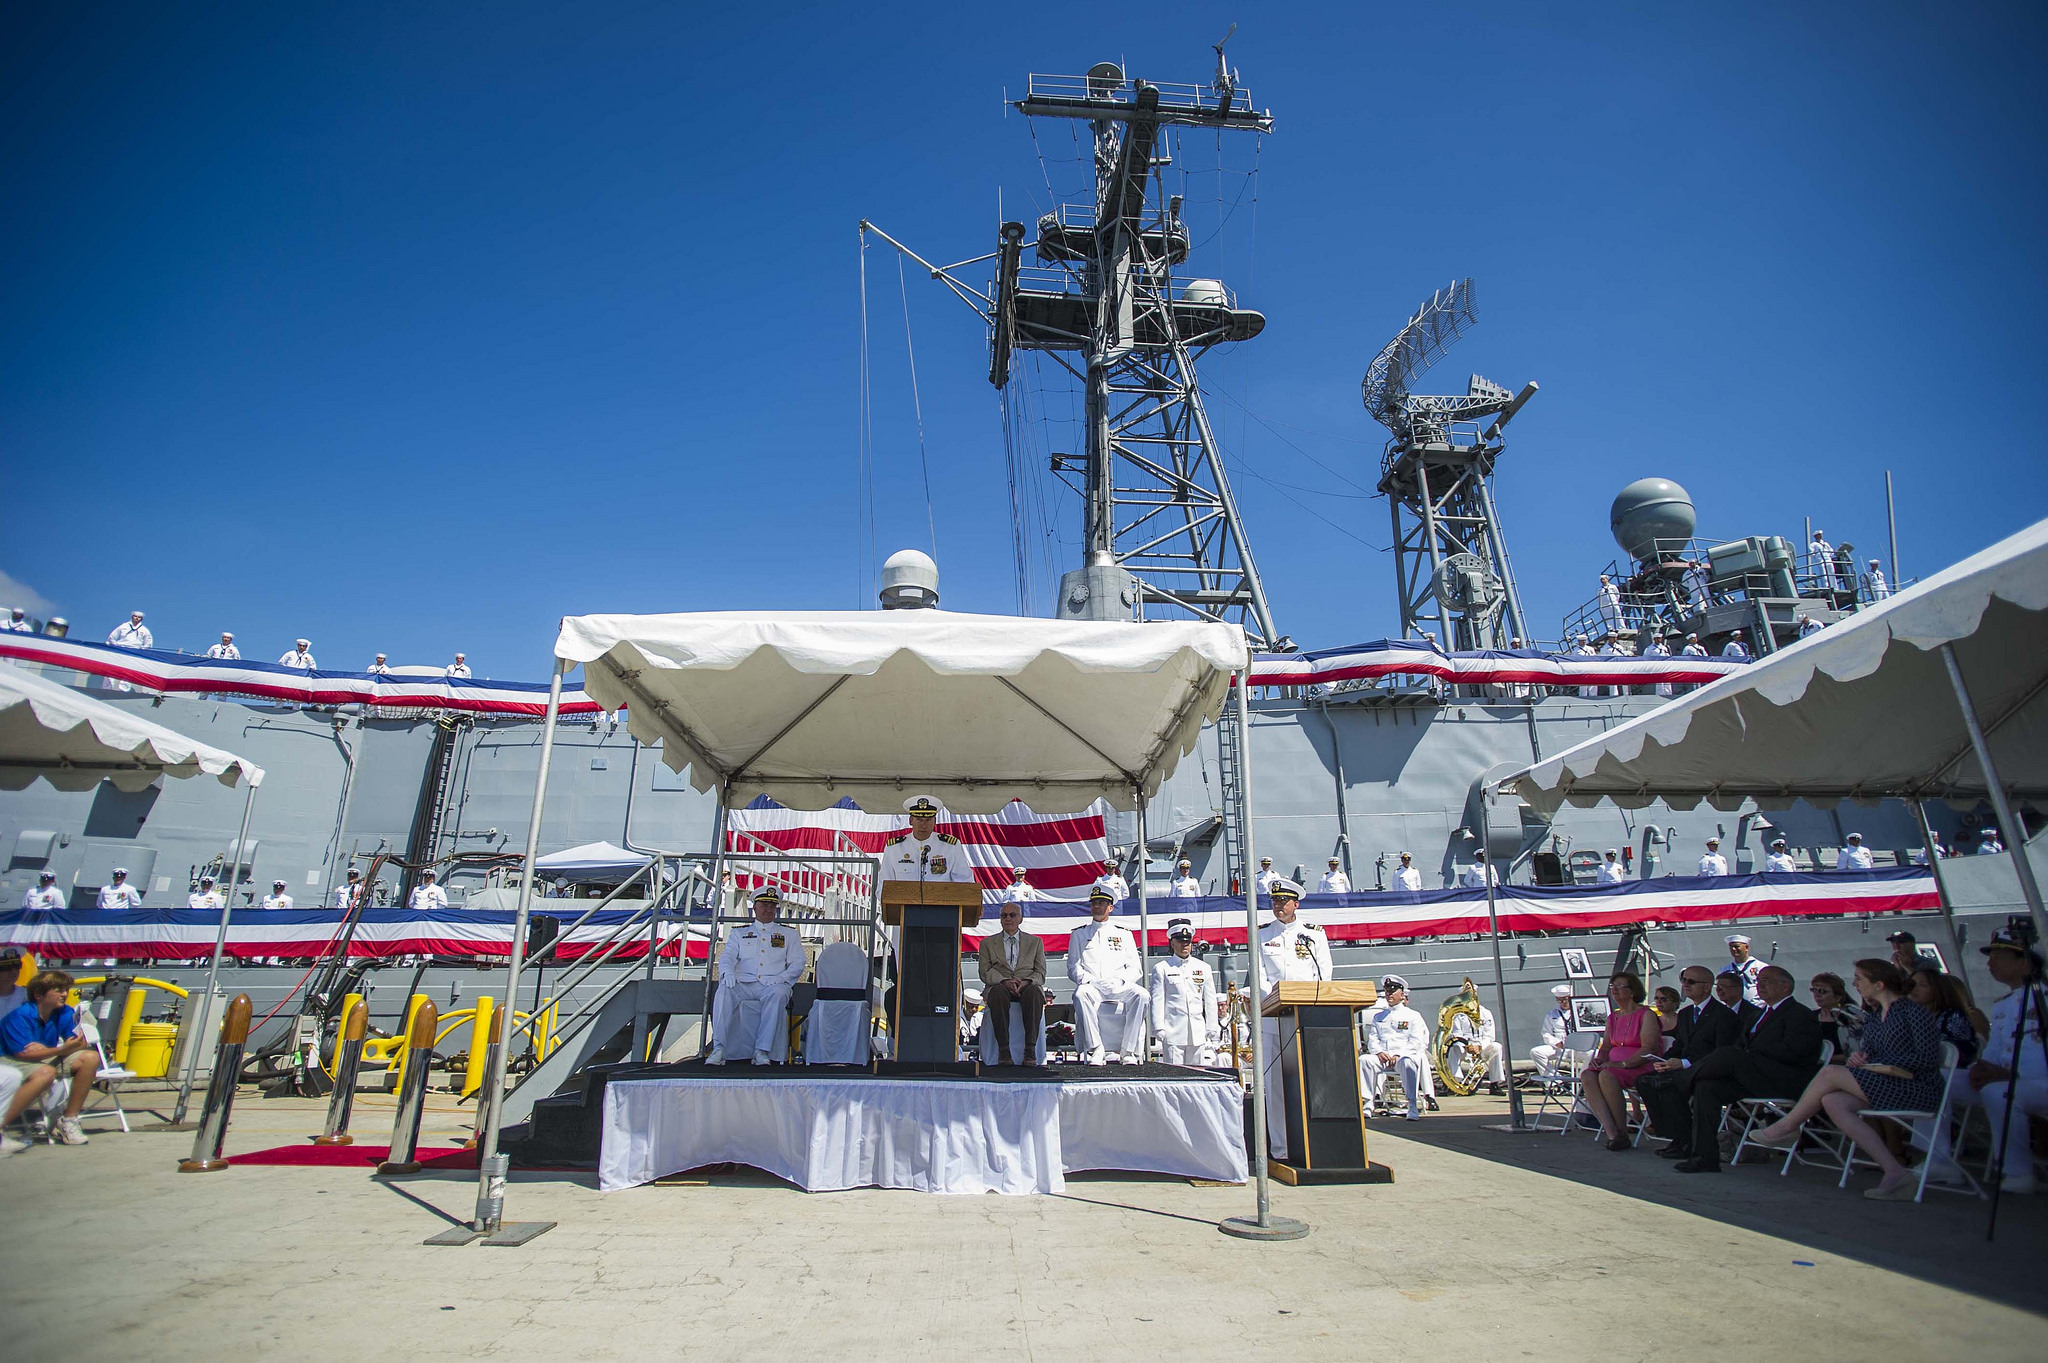 USS GARY FFG-51 Decommissioning Ceremony Bild: U.S. Navy